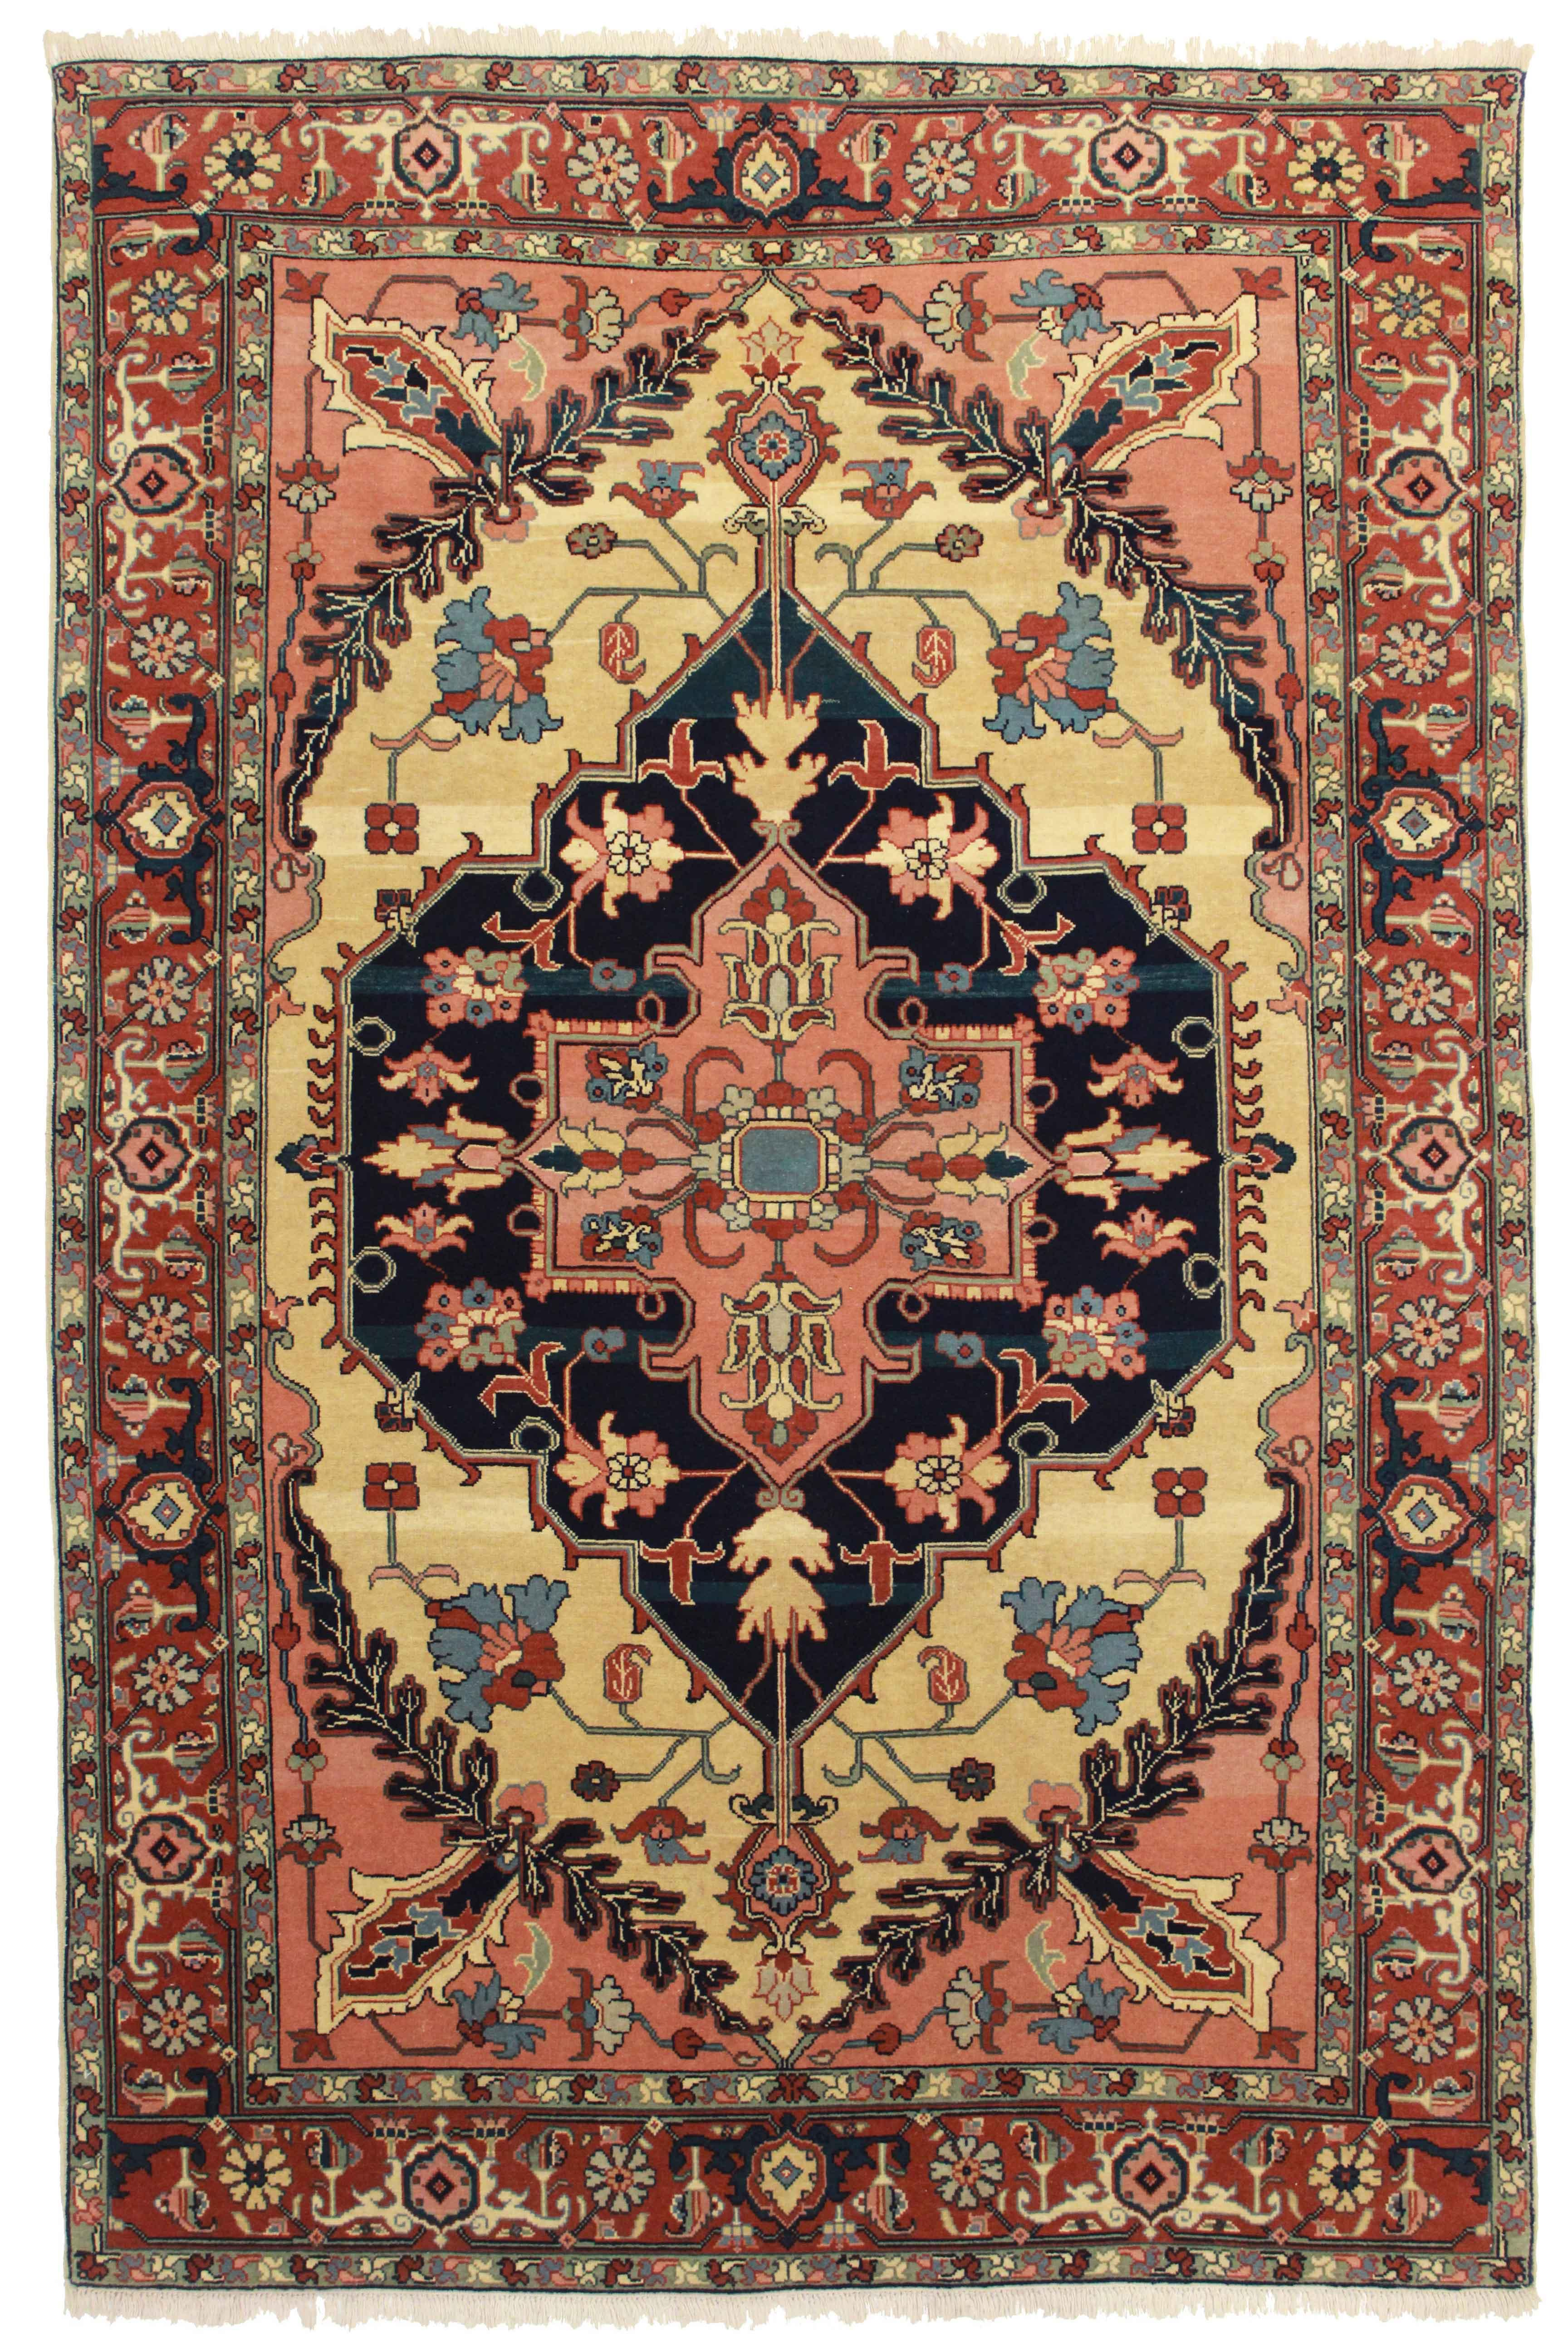 Rugsindallas Hand Knotted Wool Persian Serapi Style